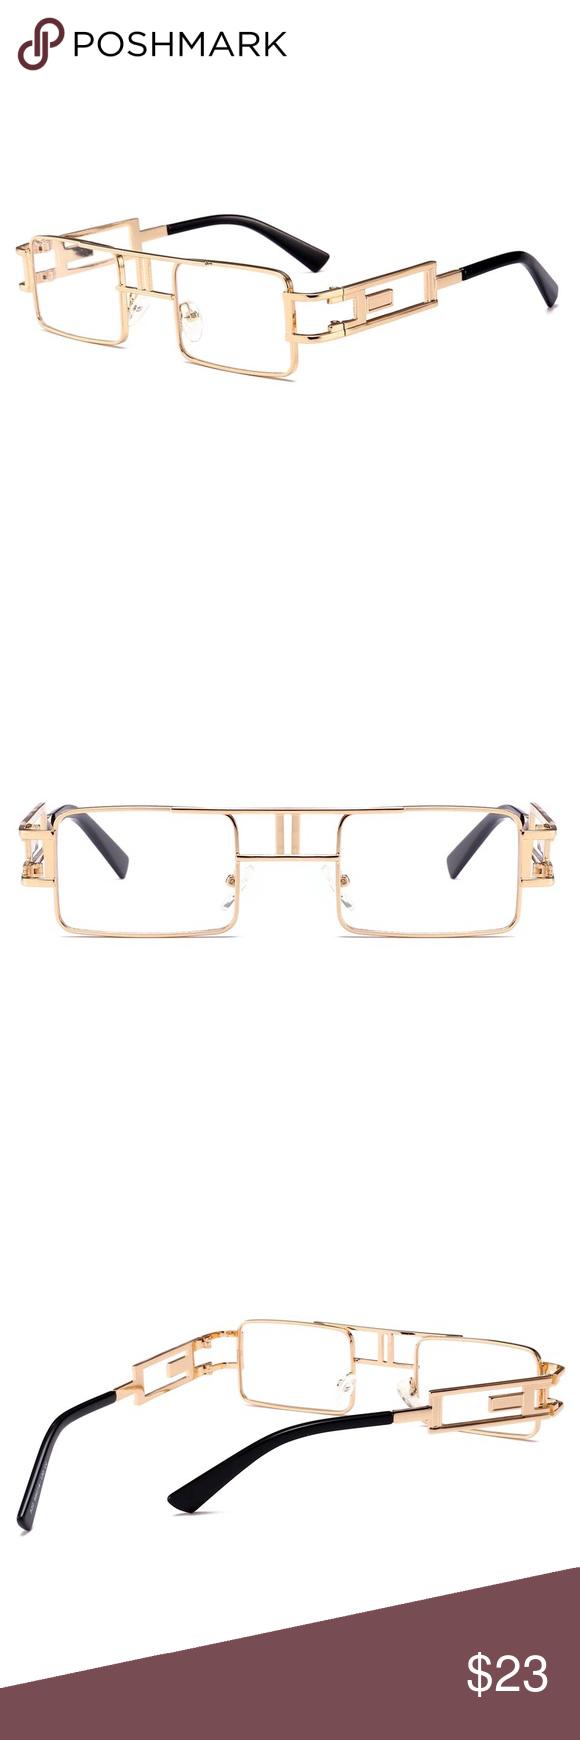 a79c0b76c1dd Hip Hop Gold Frame Clear Lens Glasses Hip Hop Gold Frame Clear Lens Glasses  Frame Material  Alloy Lens Color  Green Lens Shape  Rectangle Tsv Jewelers  ...